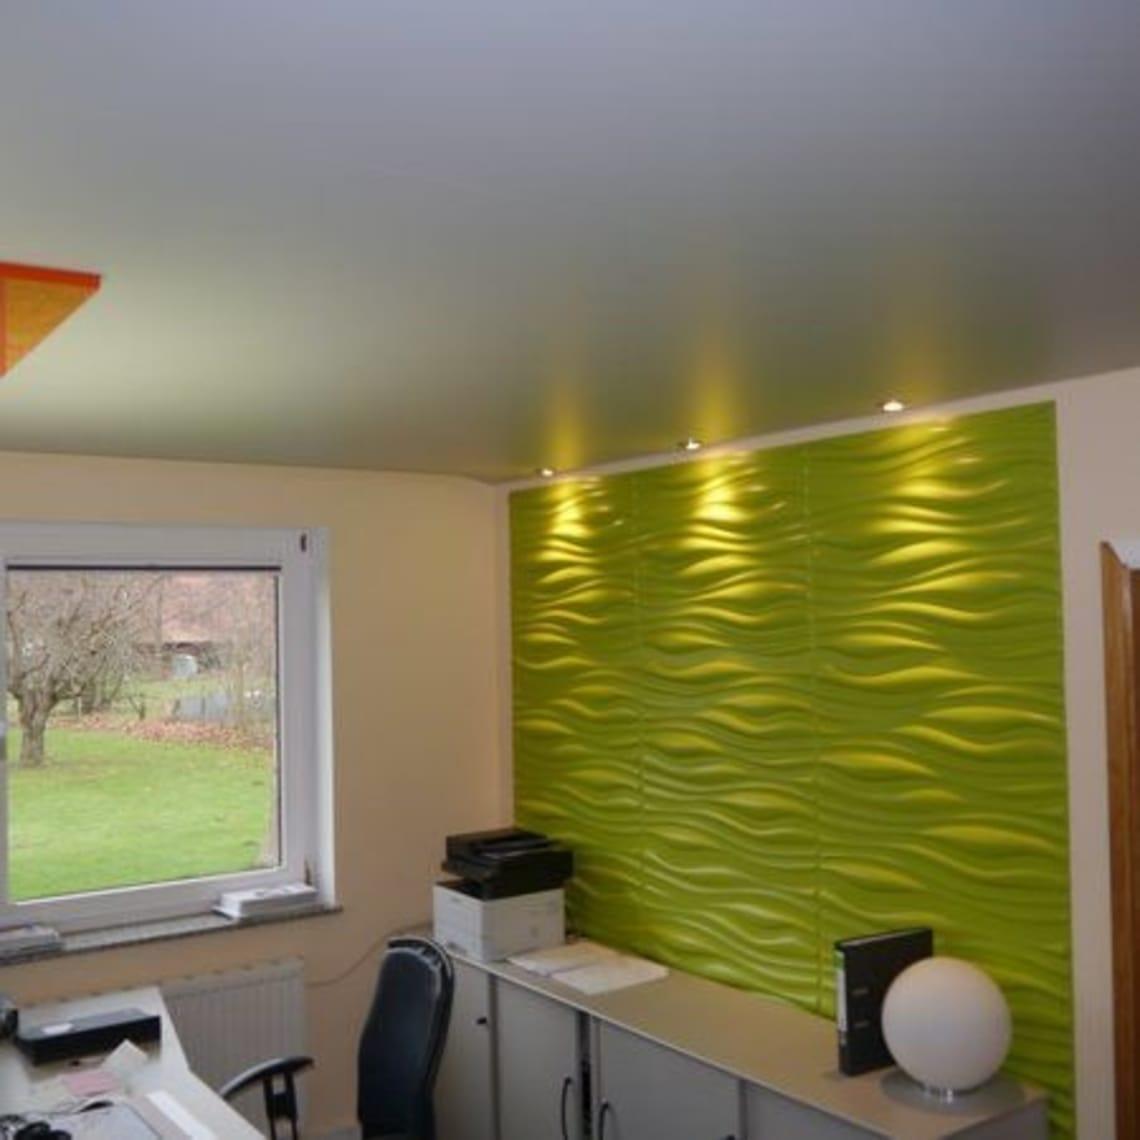 Grüne Wand mit Muster